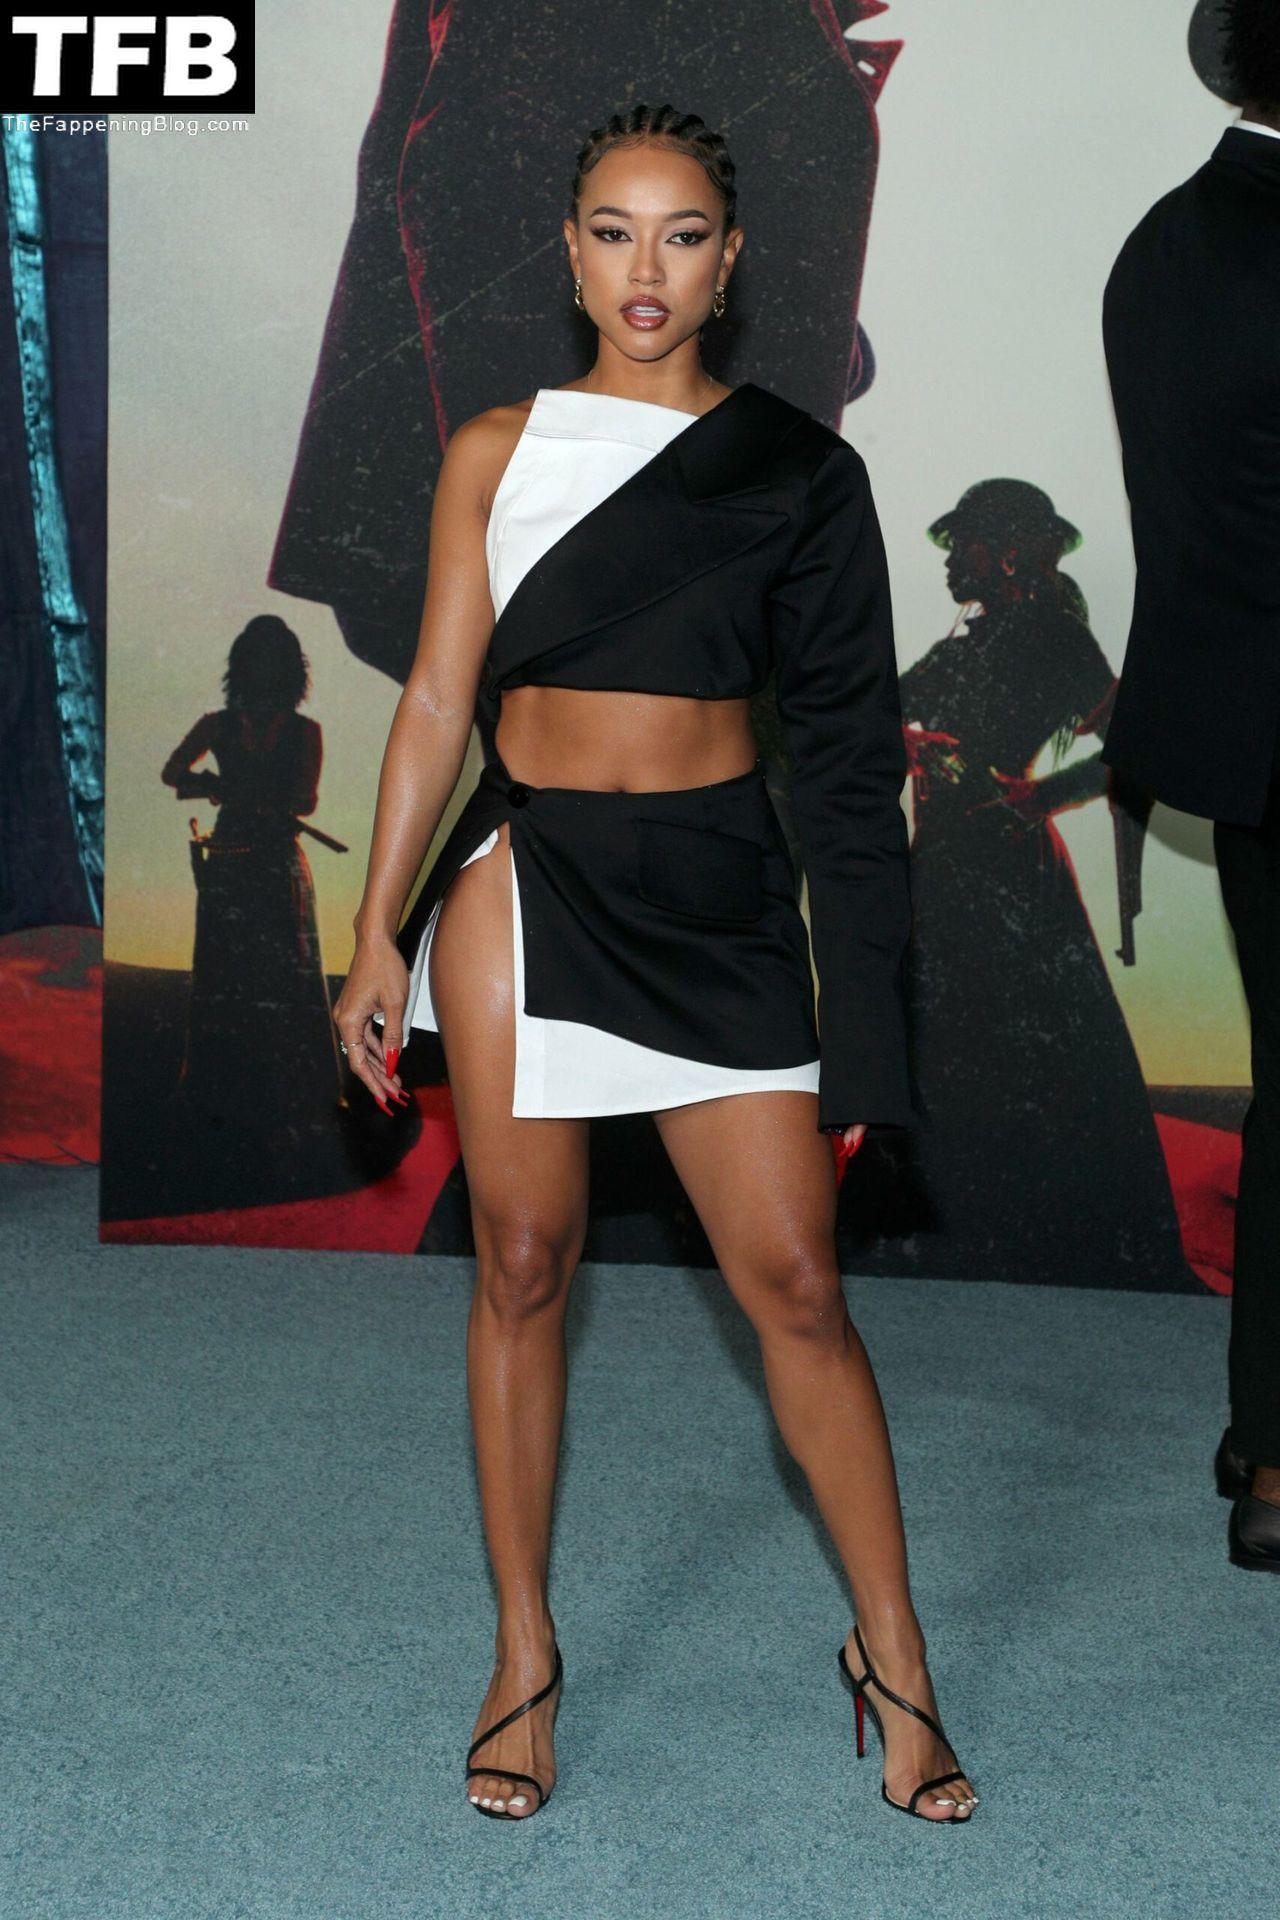 Karrueche-Tran-Sexy-Legs-Upskirt-The-Fappening-Blog-20.jpg